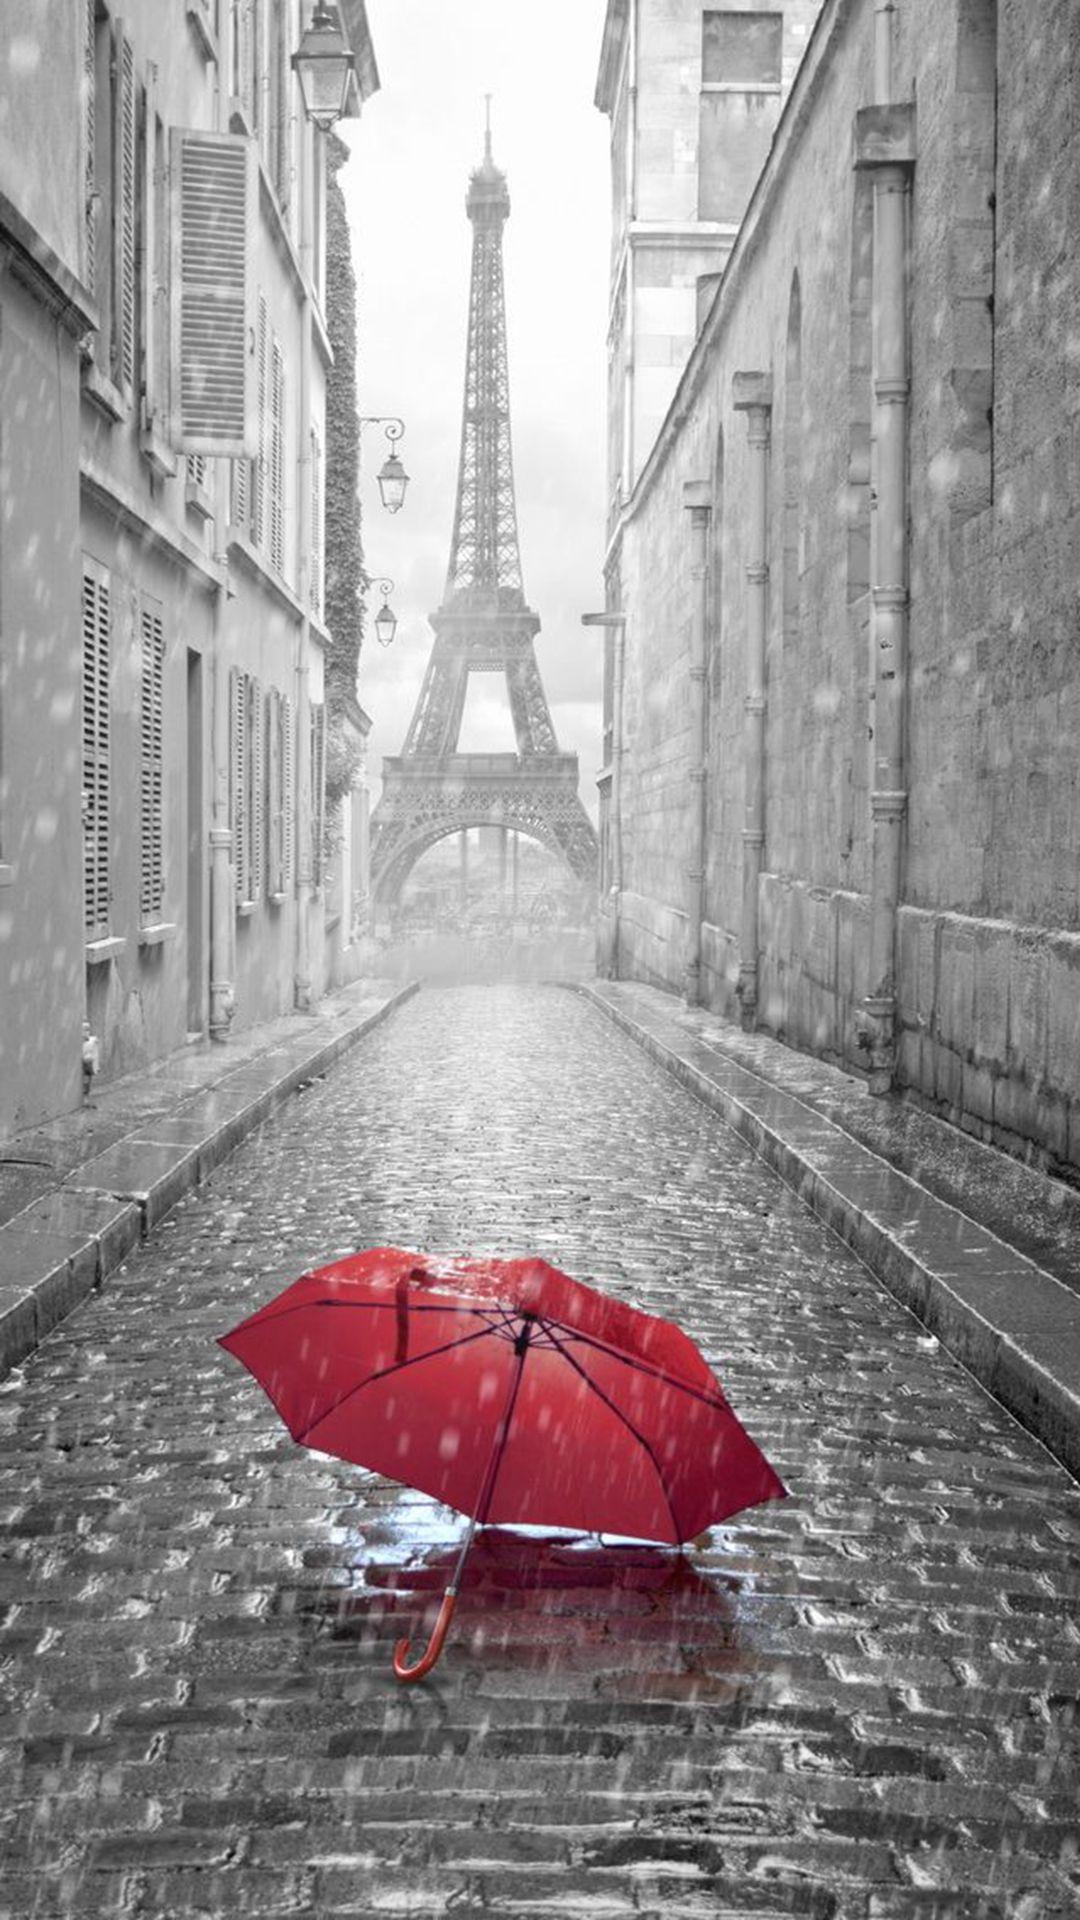 Wallpaper iphone umbrella - Red Umbrella Paris Street Rainy Day Eiffel Tower Iphone 6 Wallpaper